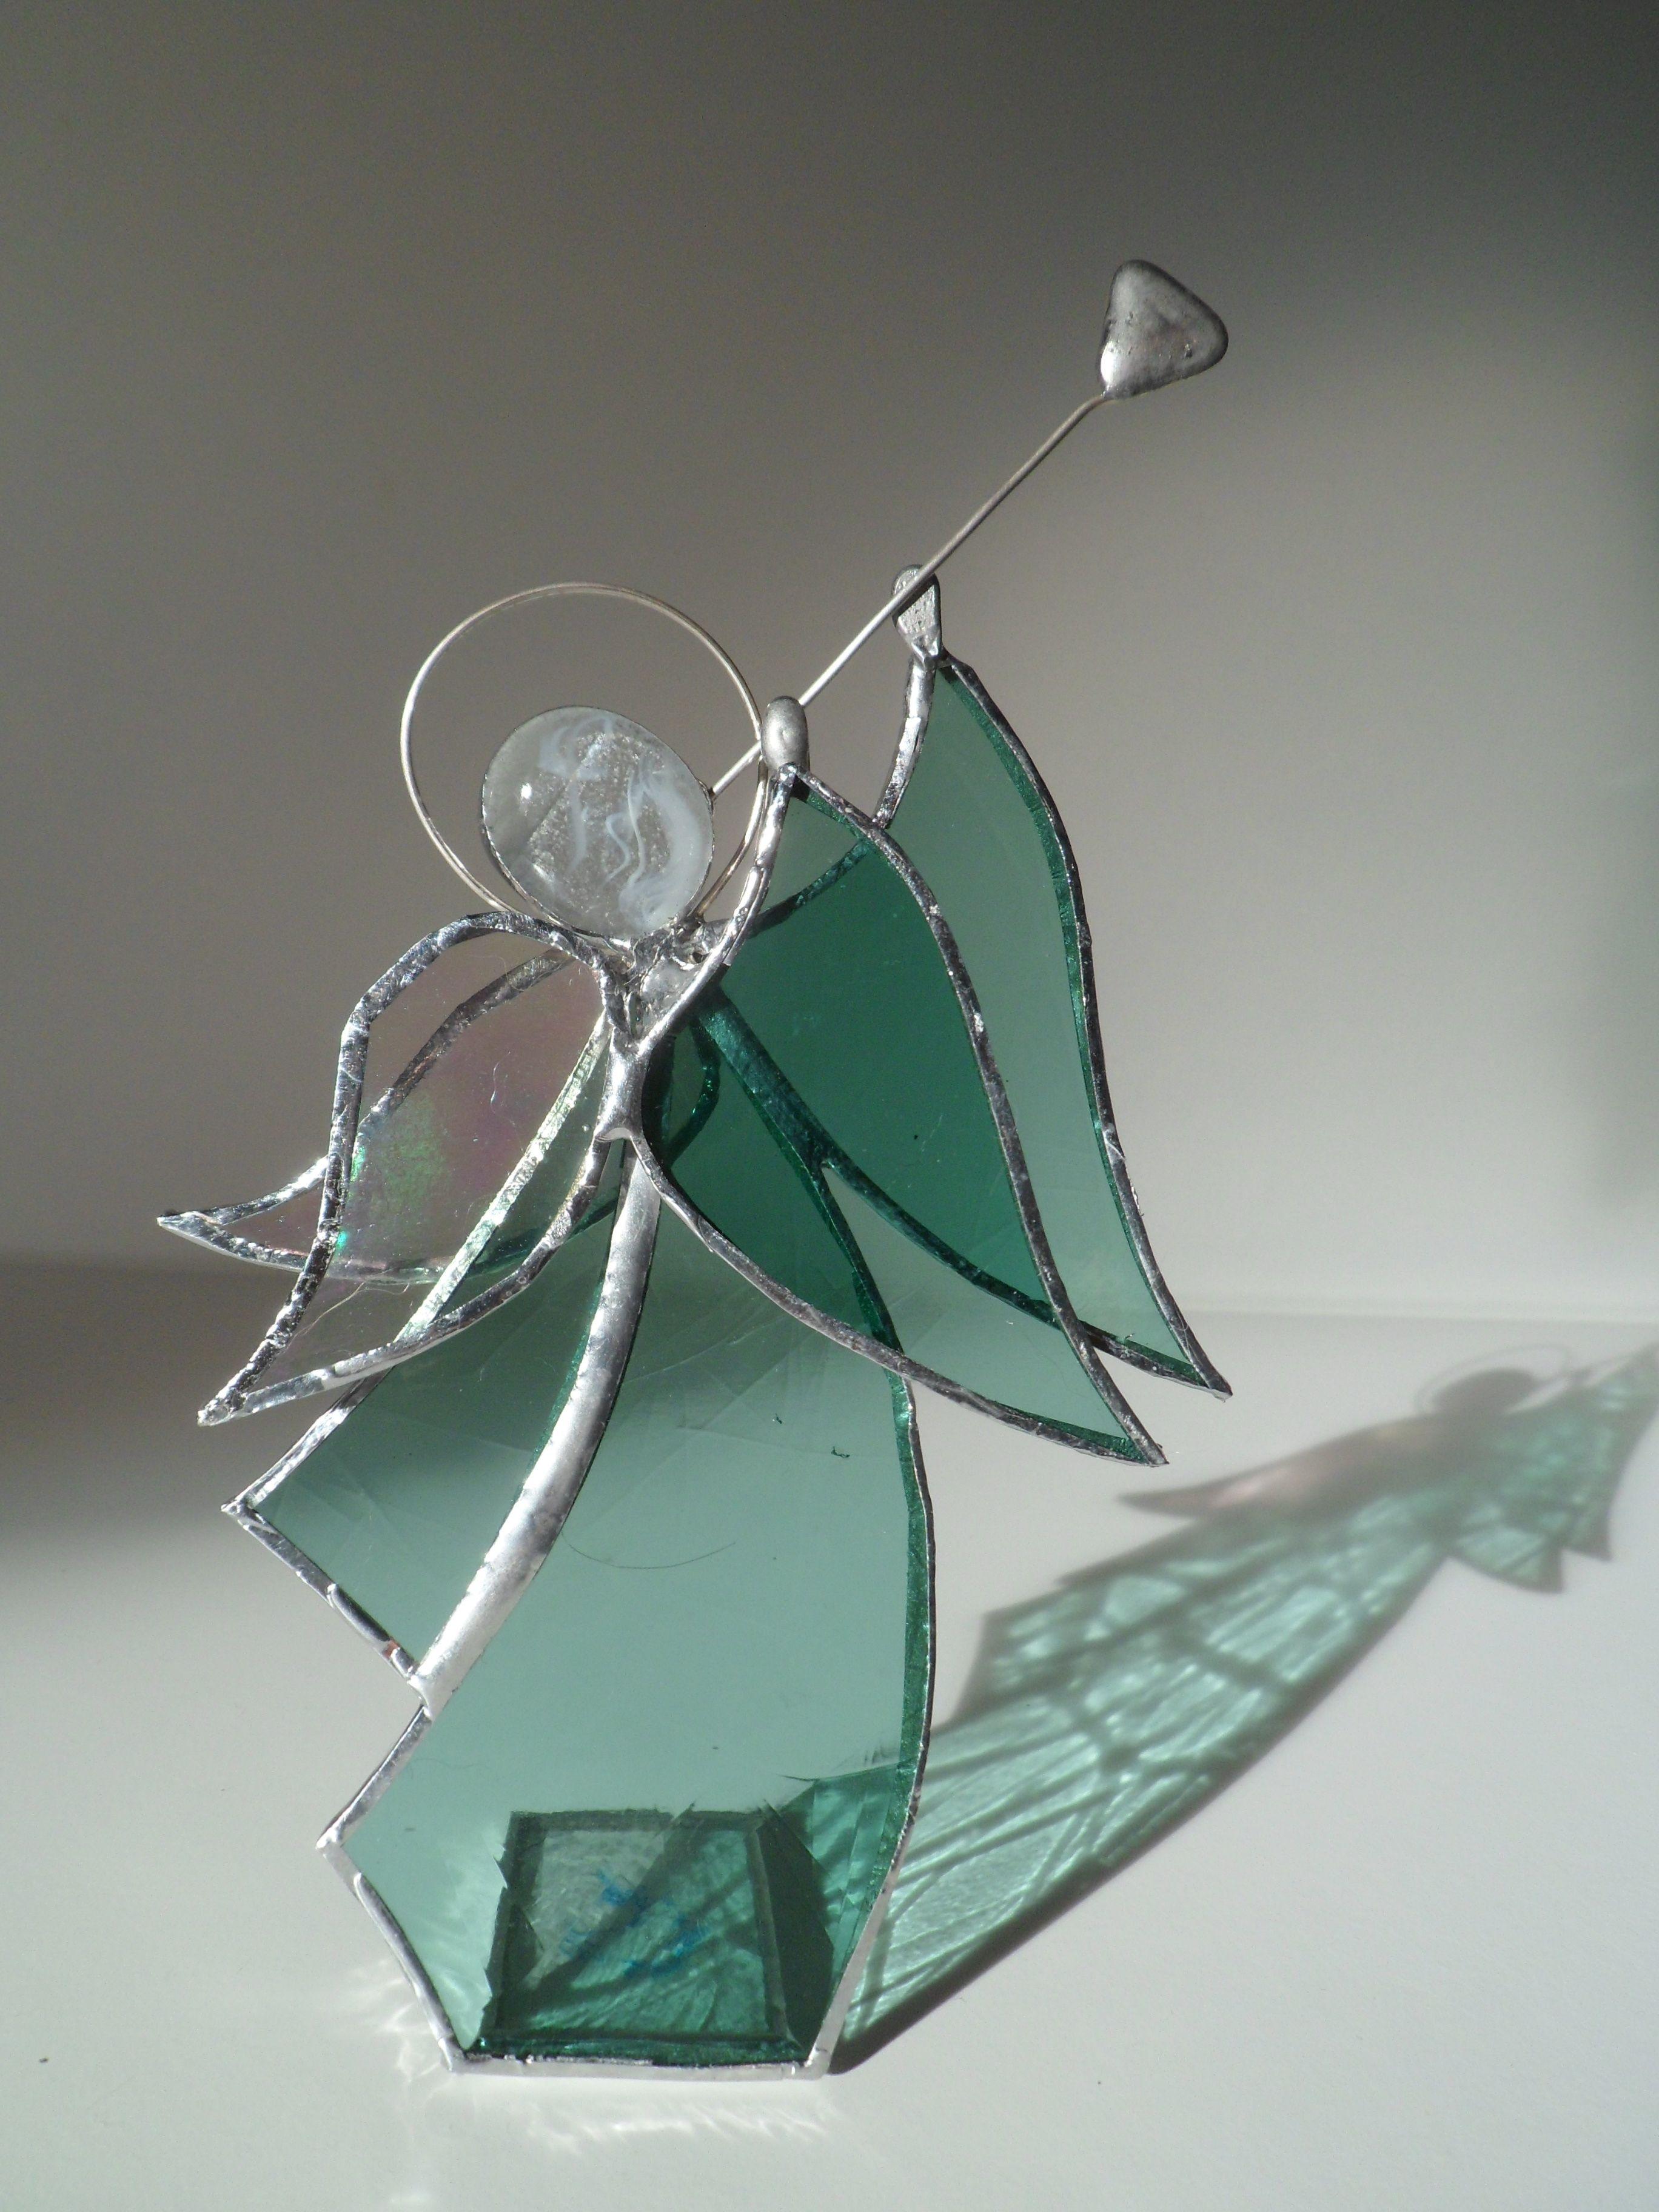 Orphin ange de no l vert vitrail anges angel vitrail stained glass pinterest no l - Patron ange de noel ...